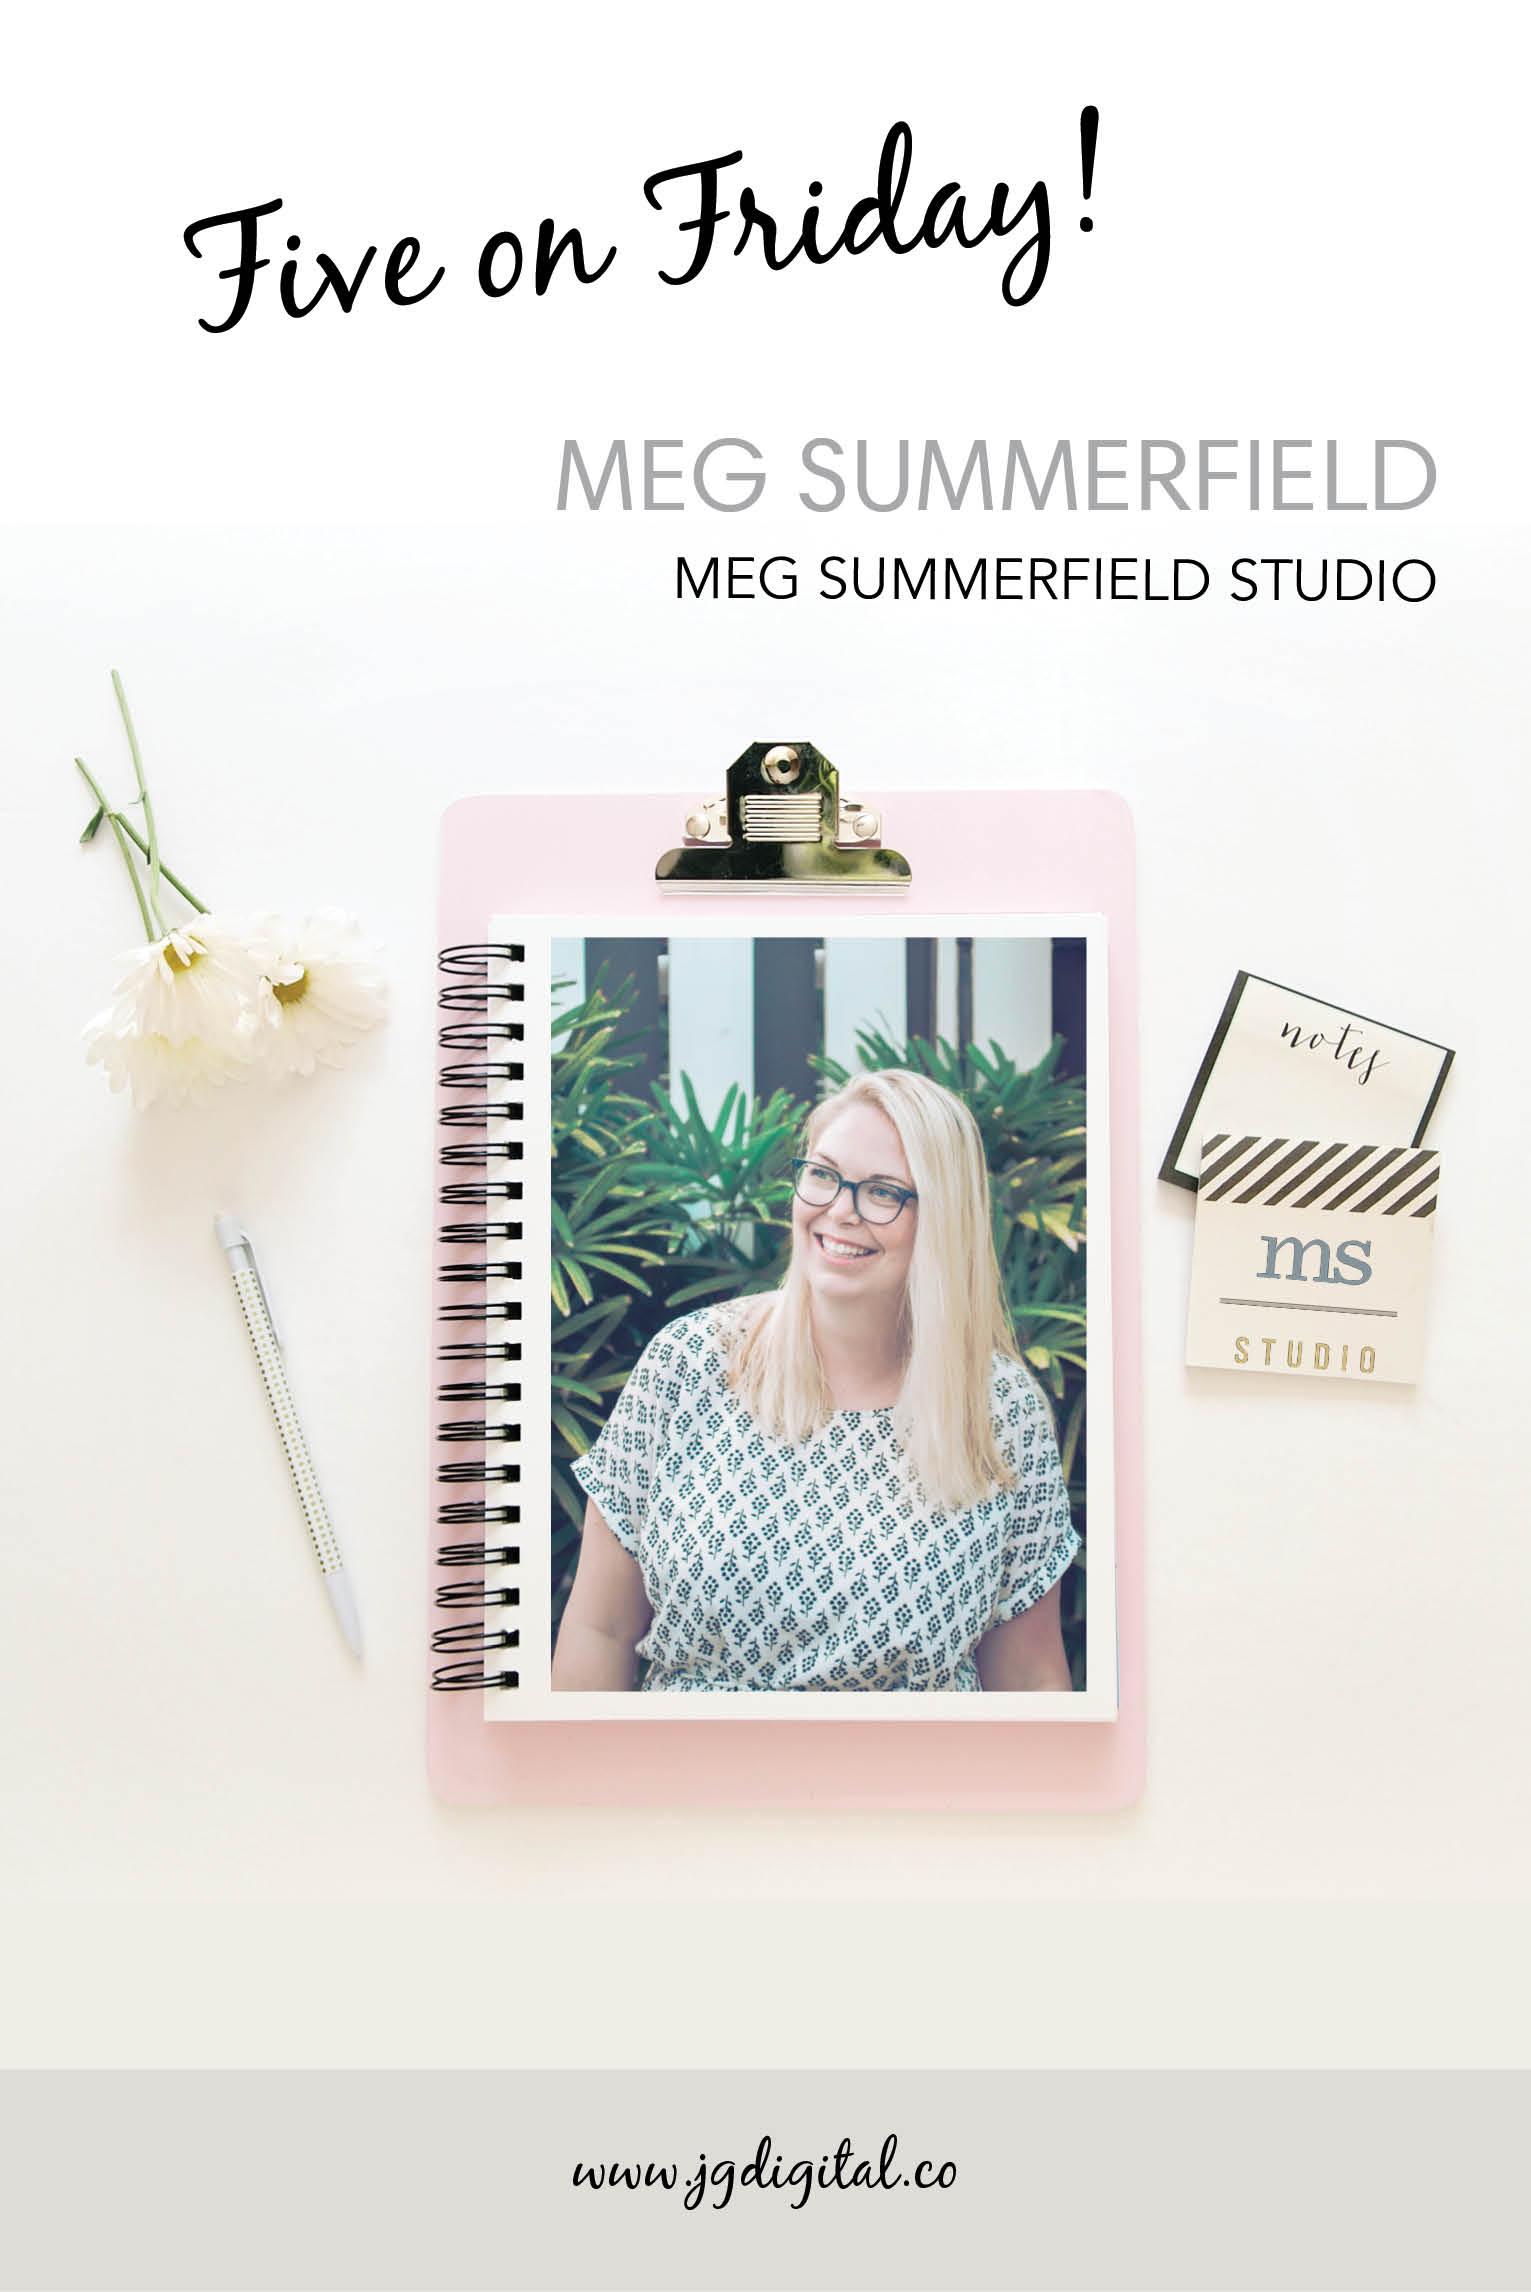 Meg Summerfield